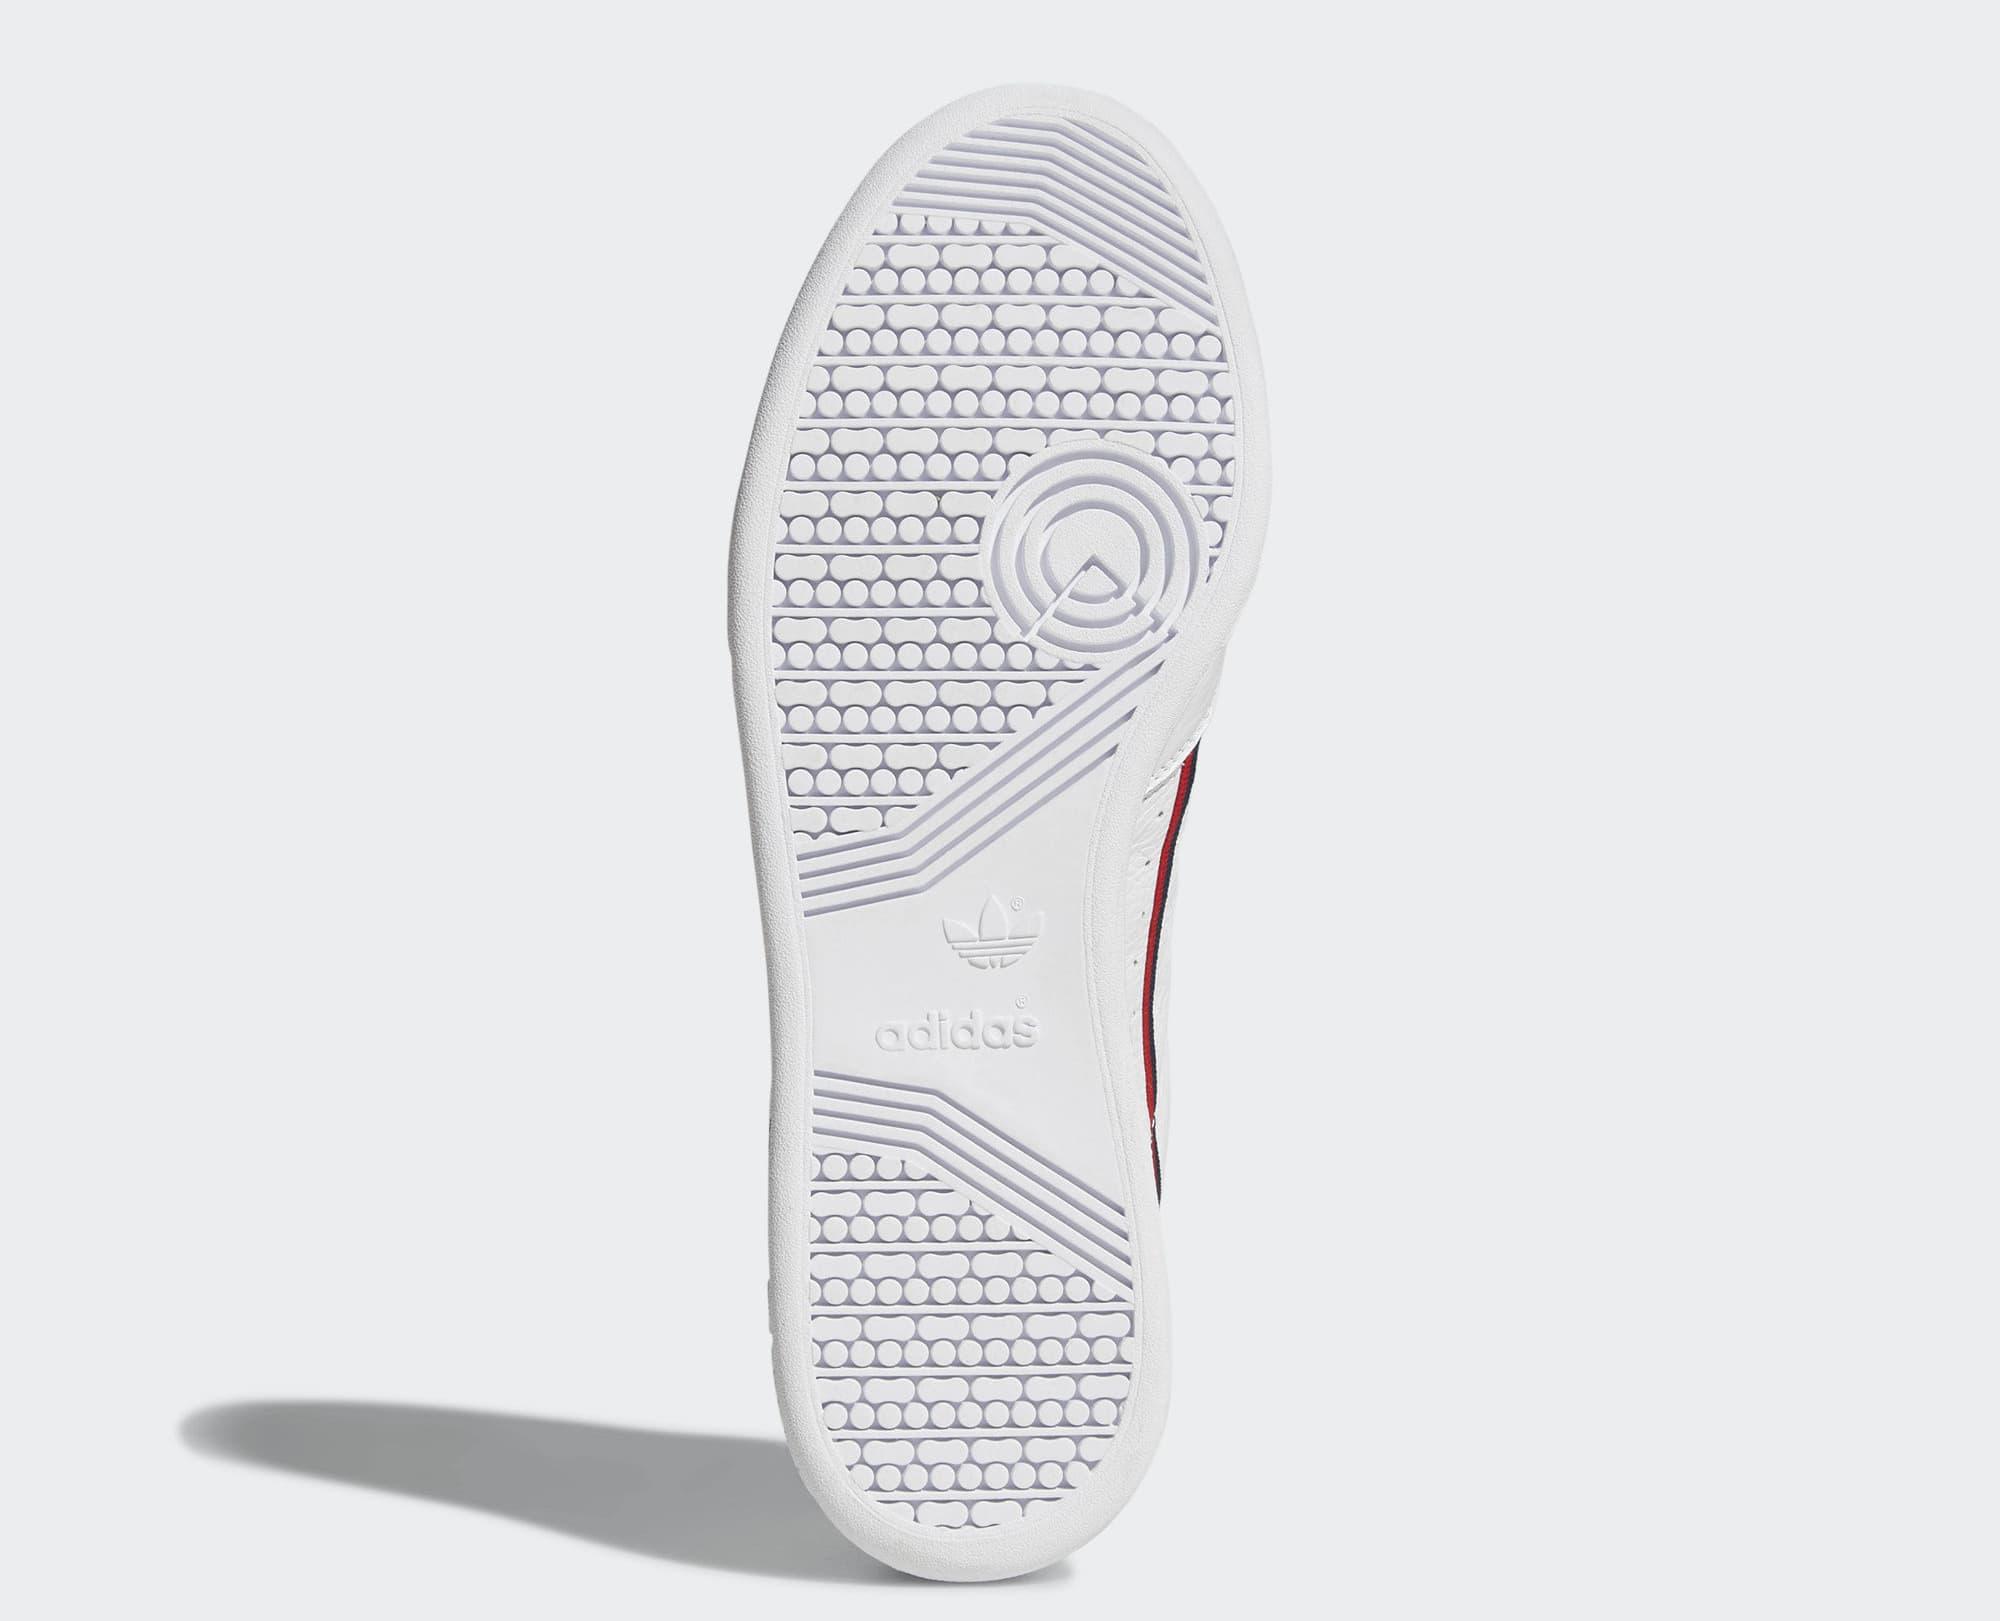 Adidas Continental 80 Rascal B41674 (Sole)